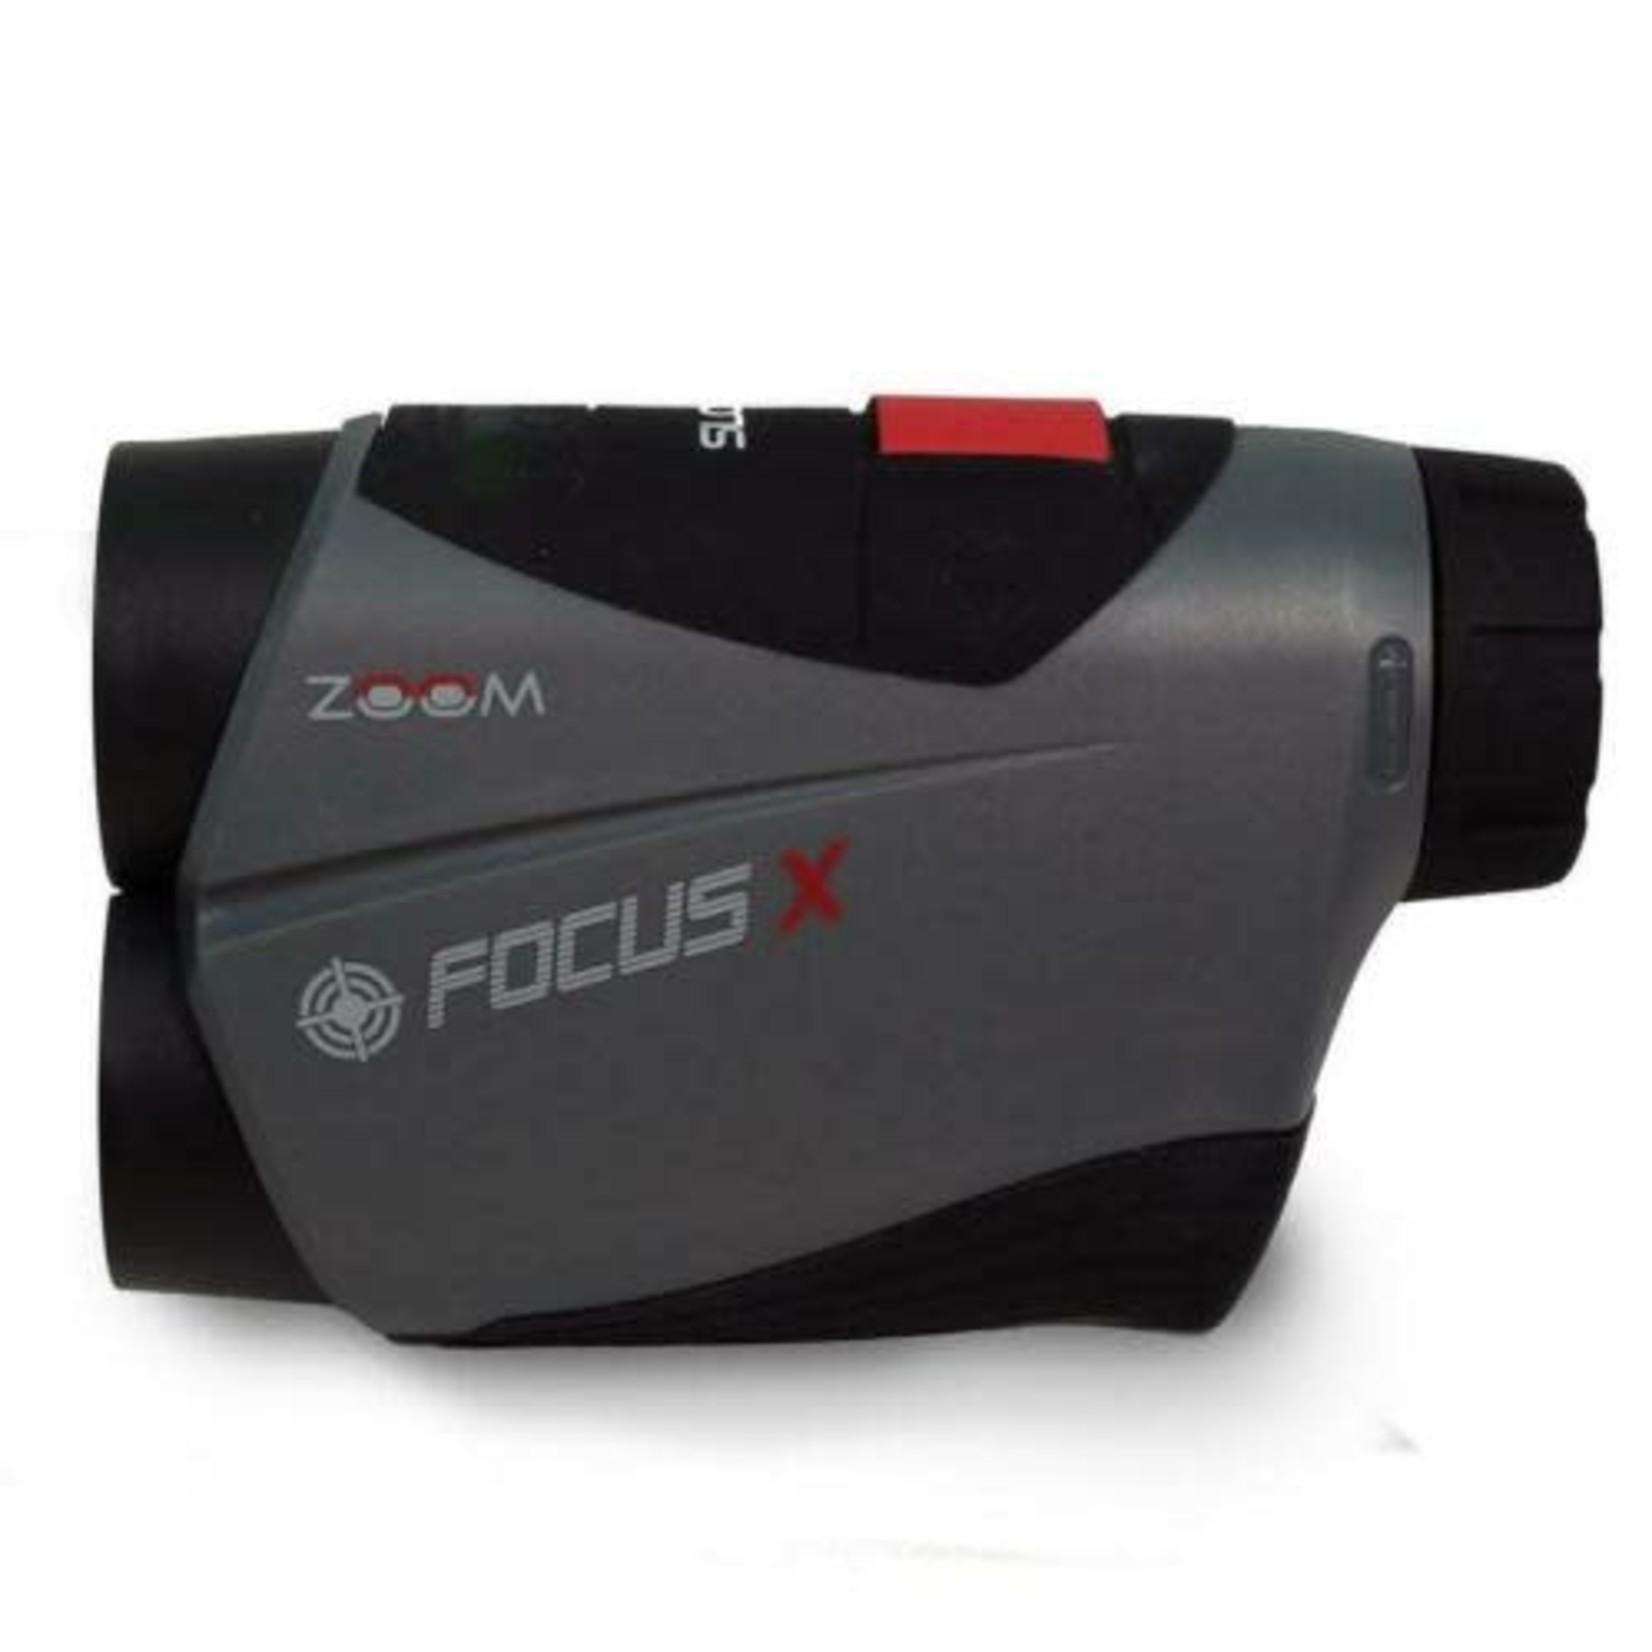 Zoom Zoom Focus X - Charcoal